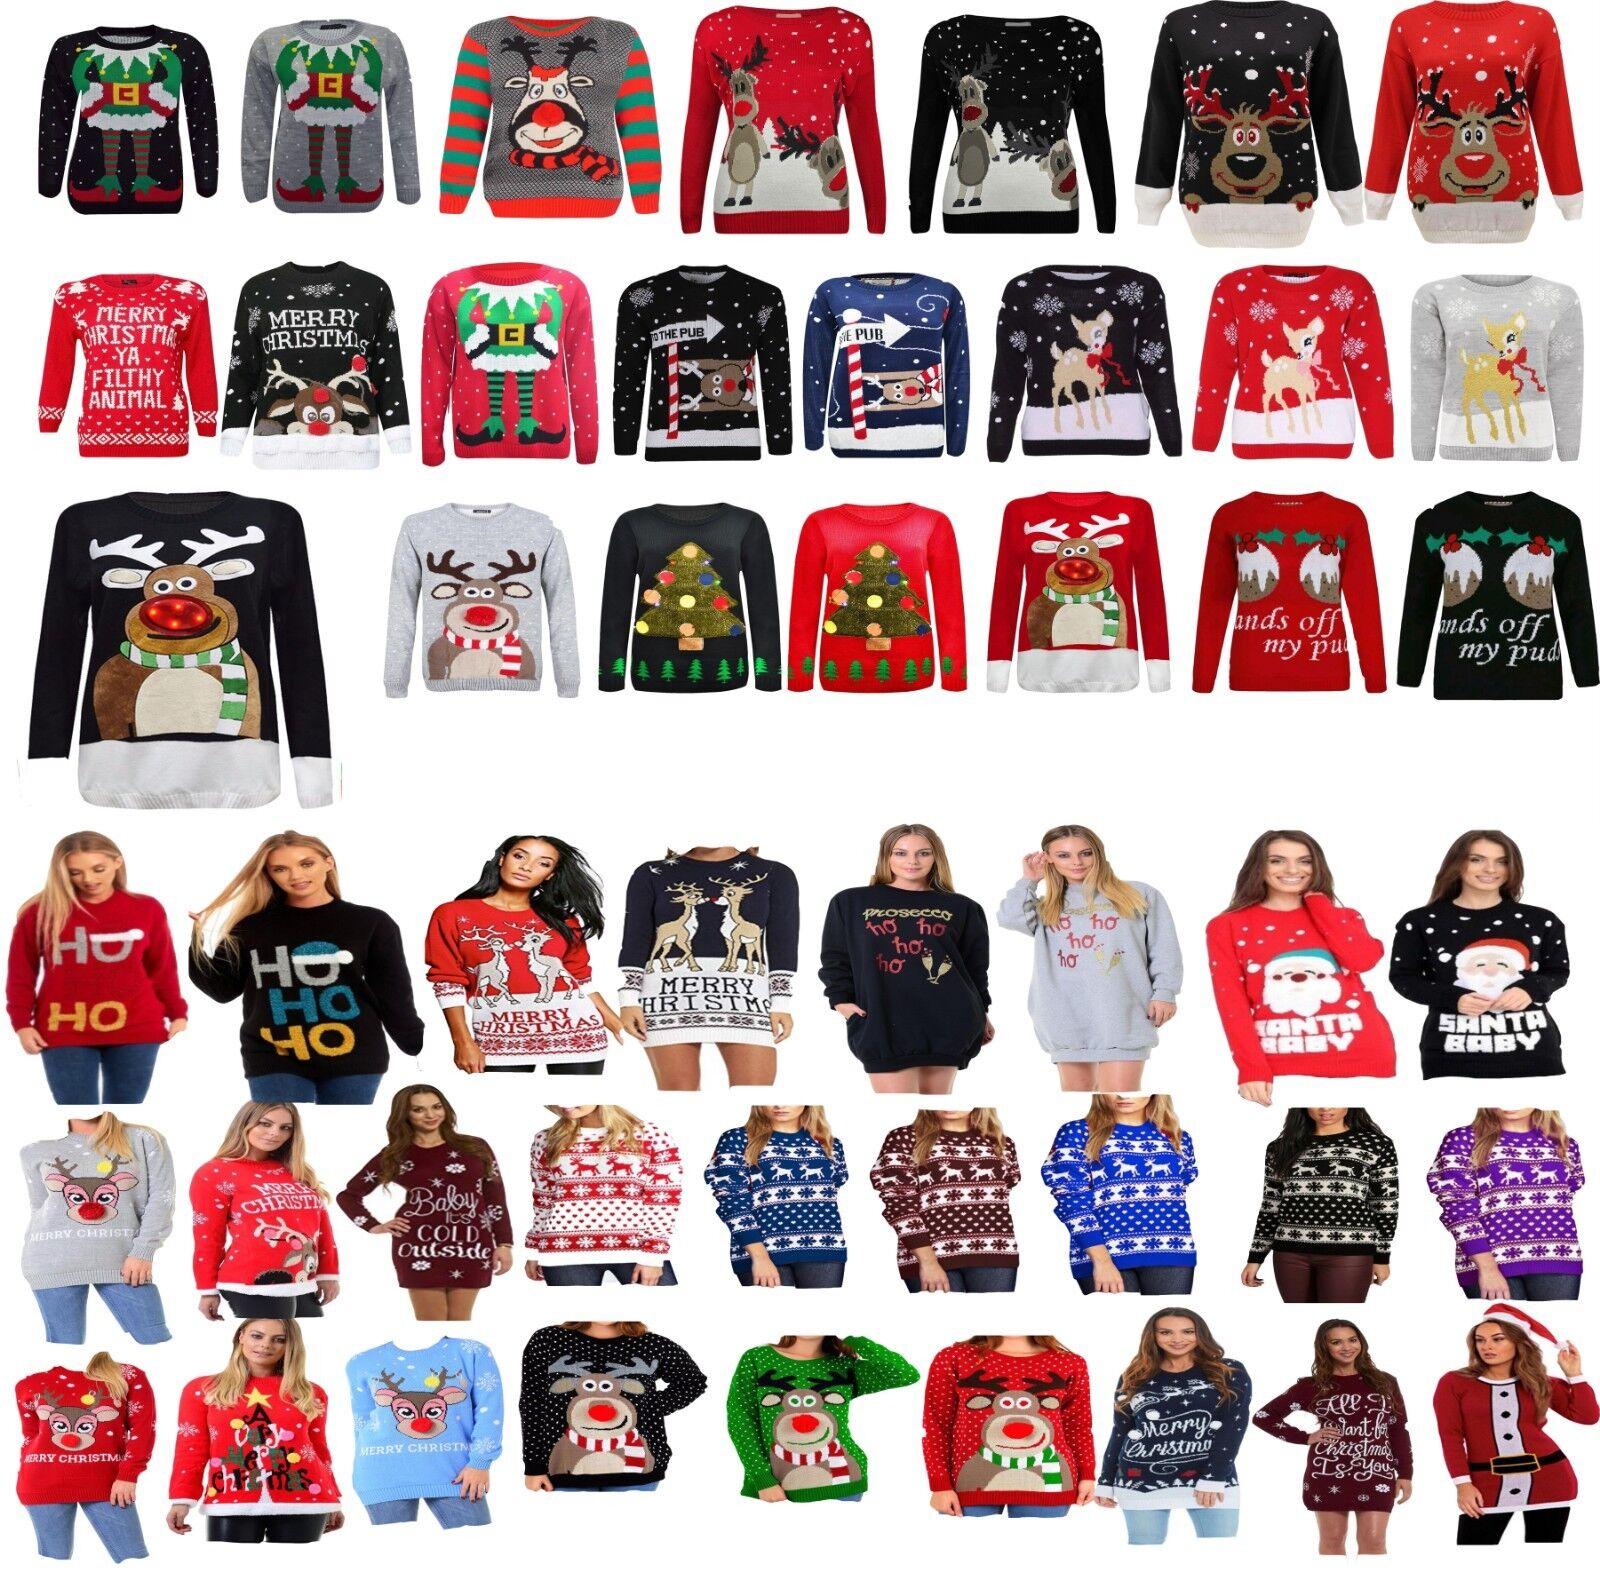 Femmes Femmes Hommes Femmes Femmes Noël Ugly Christmas Jumpers Rennes Rétro 3D Light Sweater Top 3e62e7